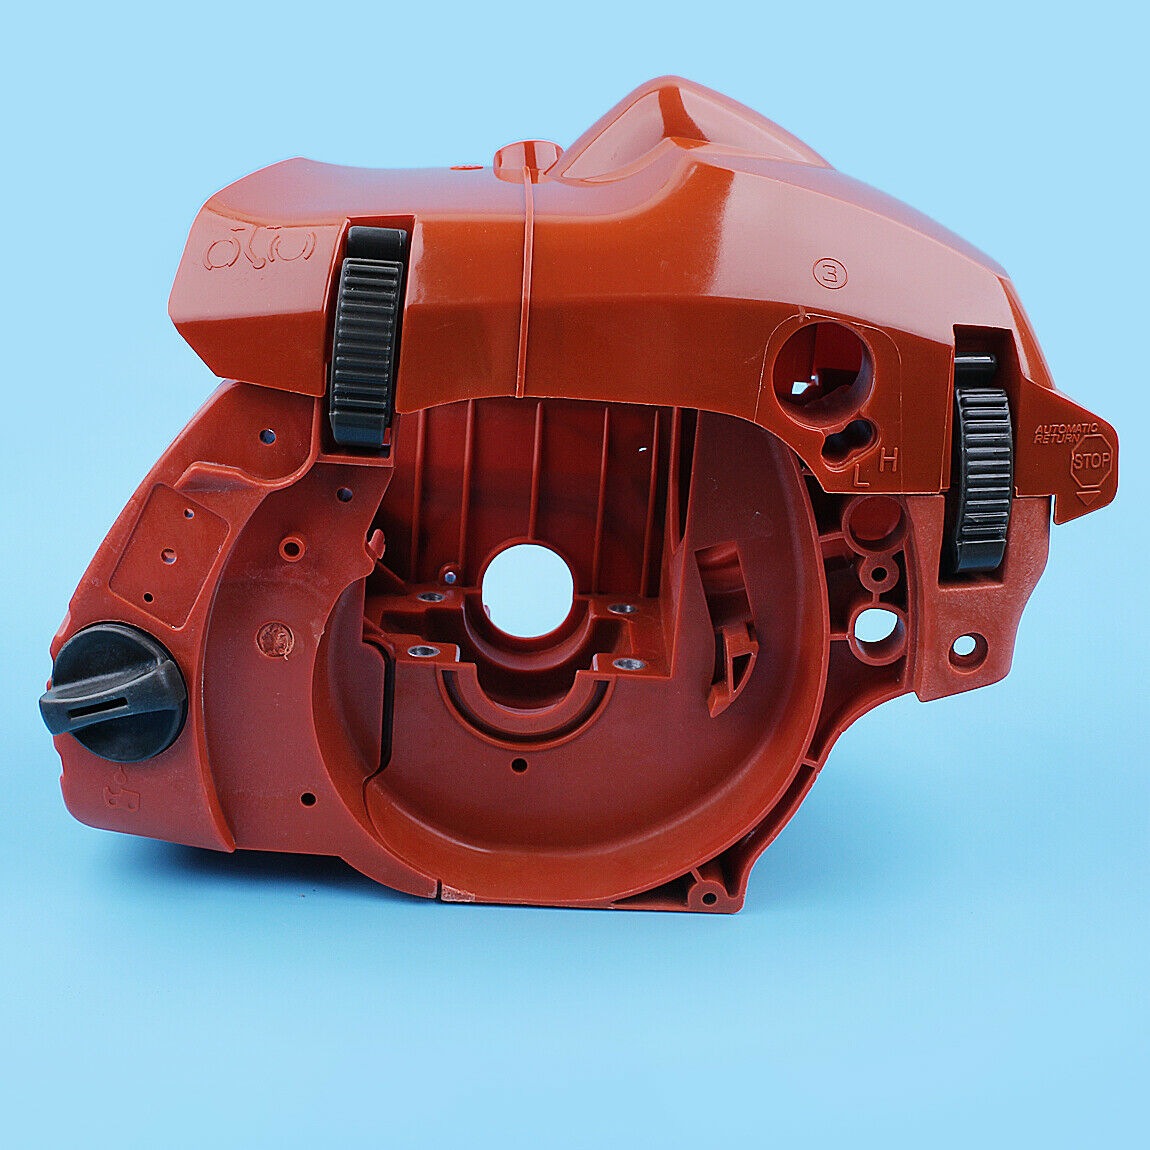 Gas Fuel Oil Tank Cap Kit For Husqvarna 440 440E 445 445E 450 450E Chainsaw